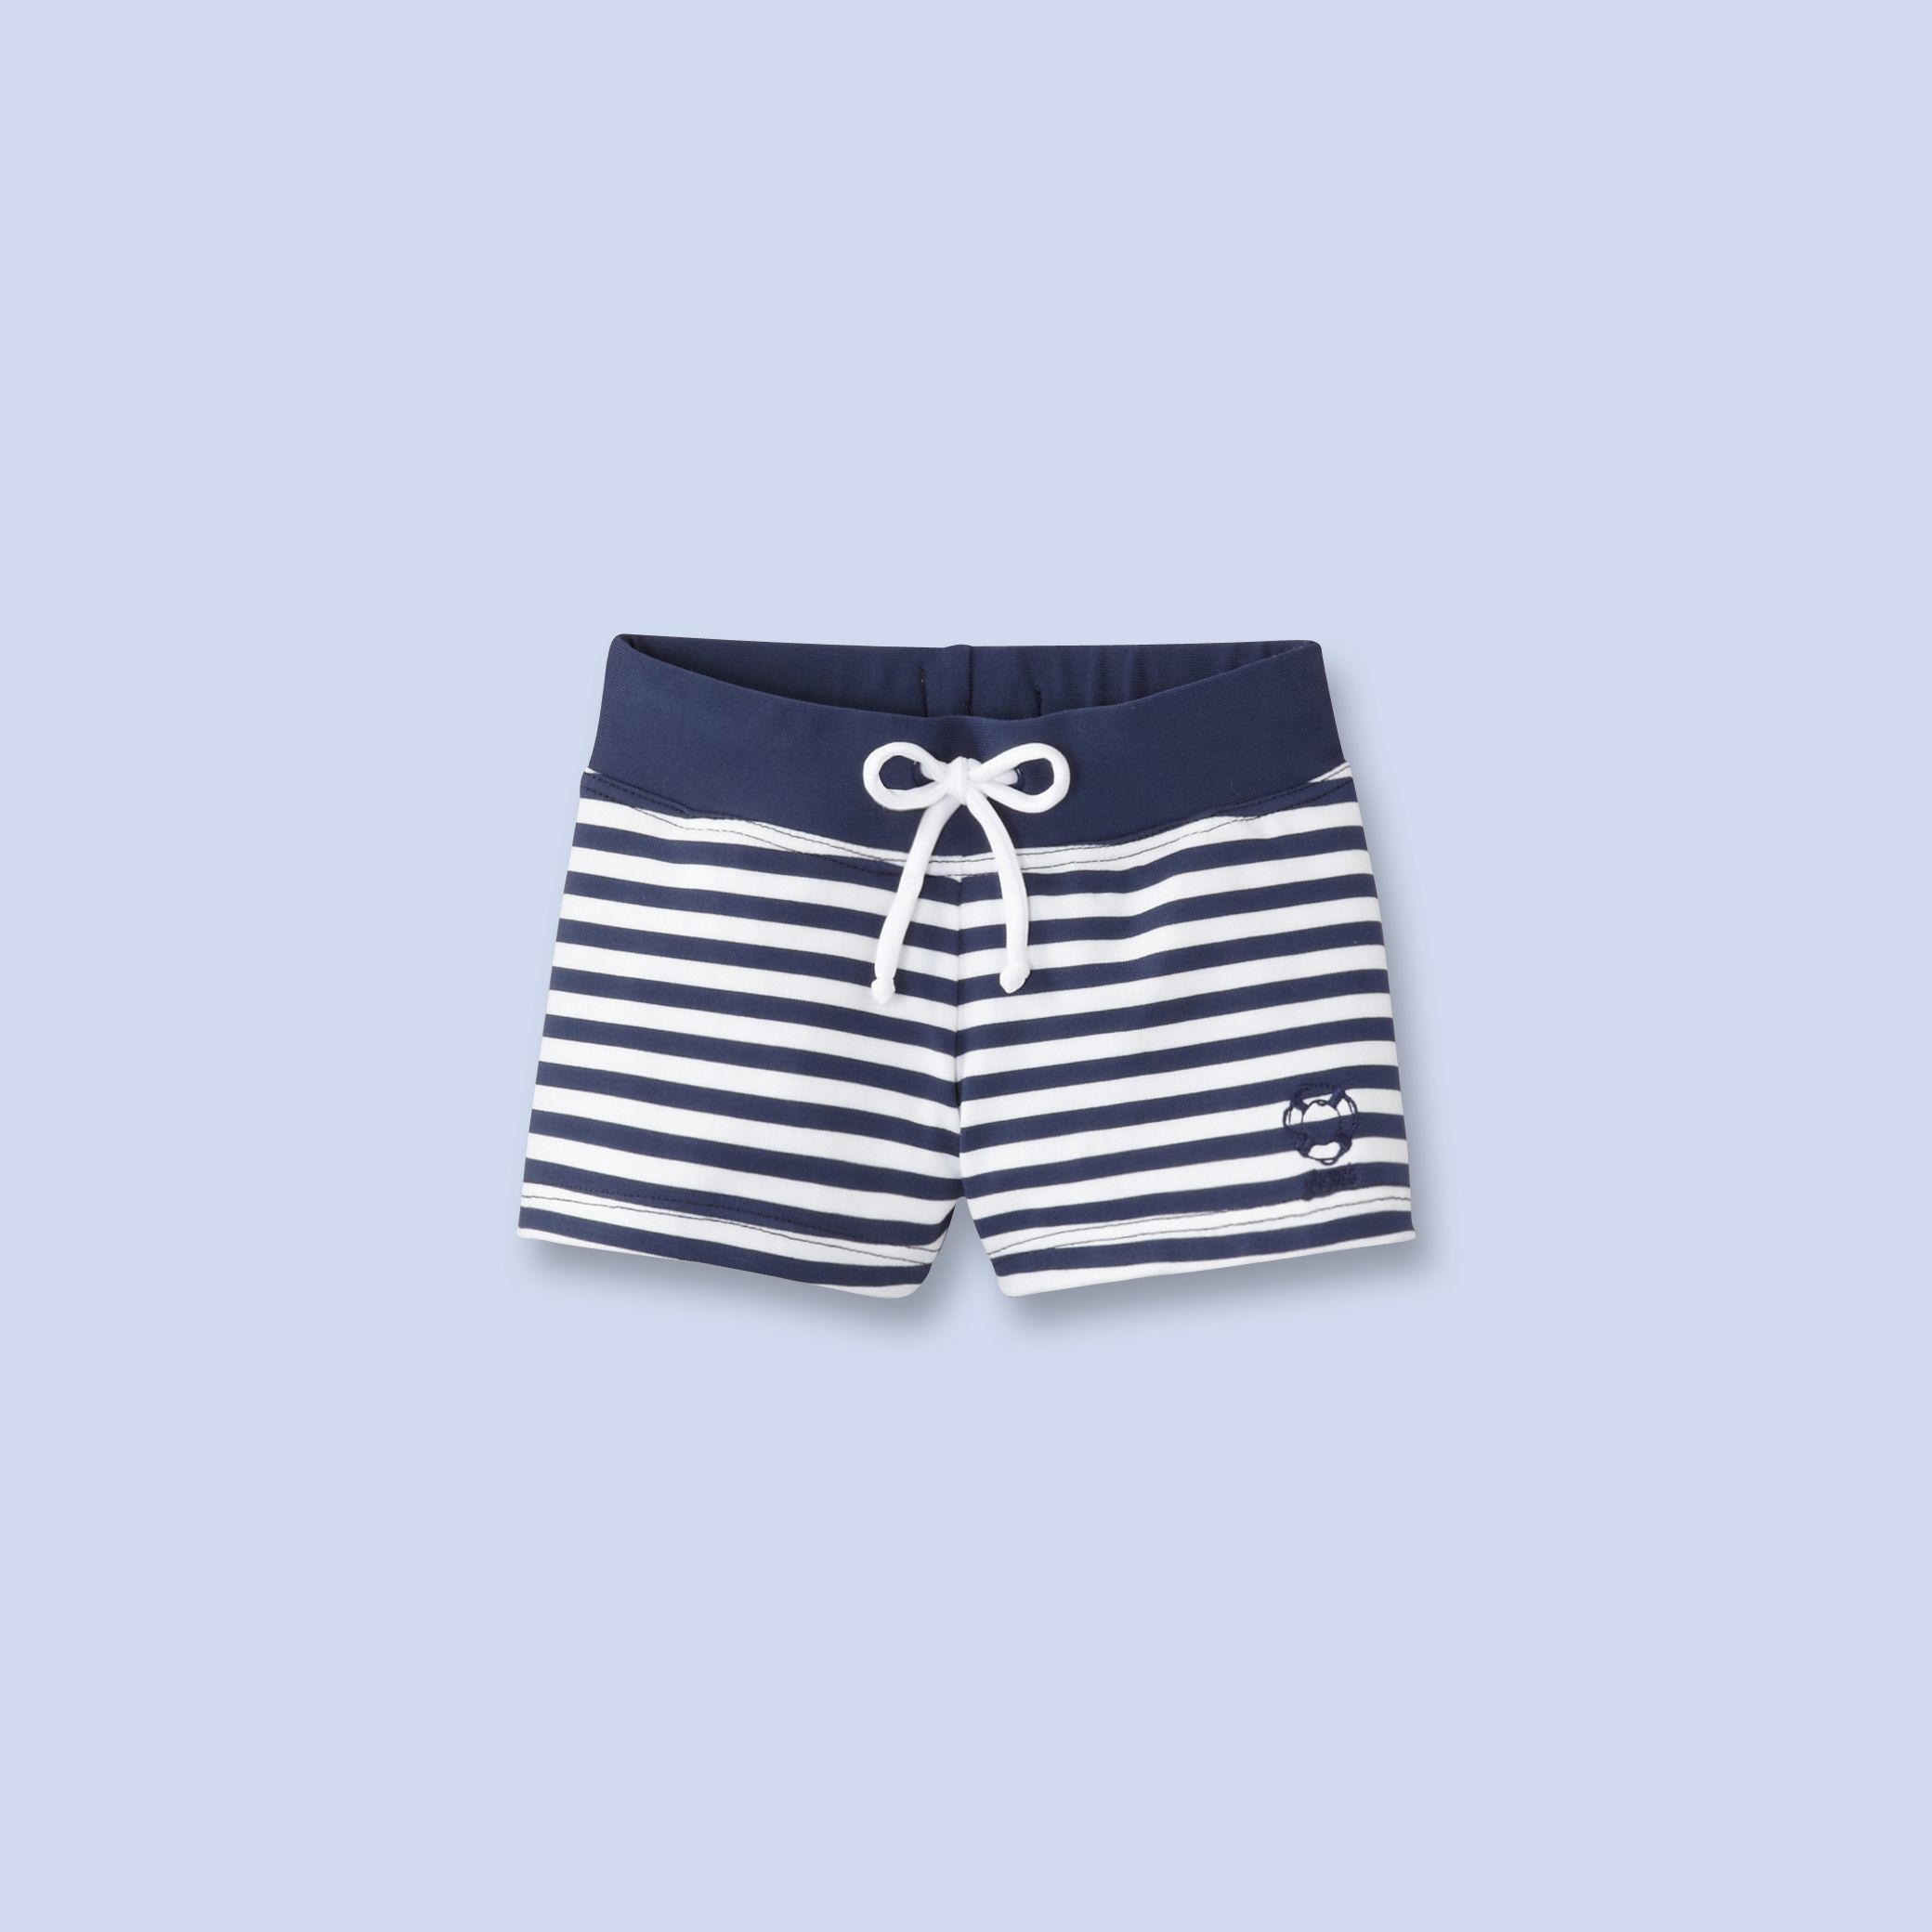 Navy striped swimsuit for baby boy Swimwear Pinterest